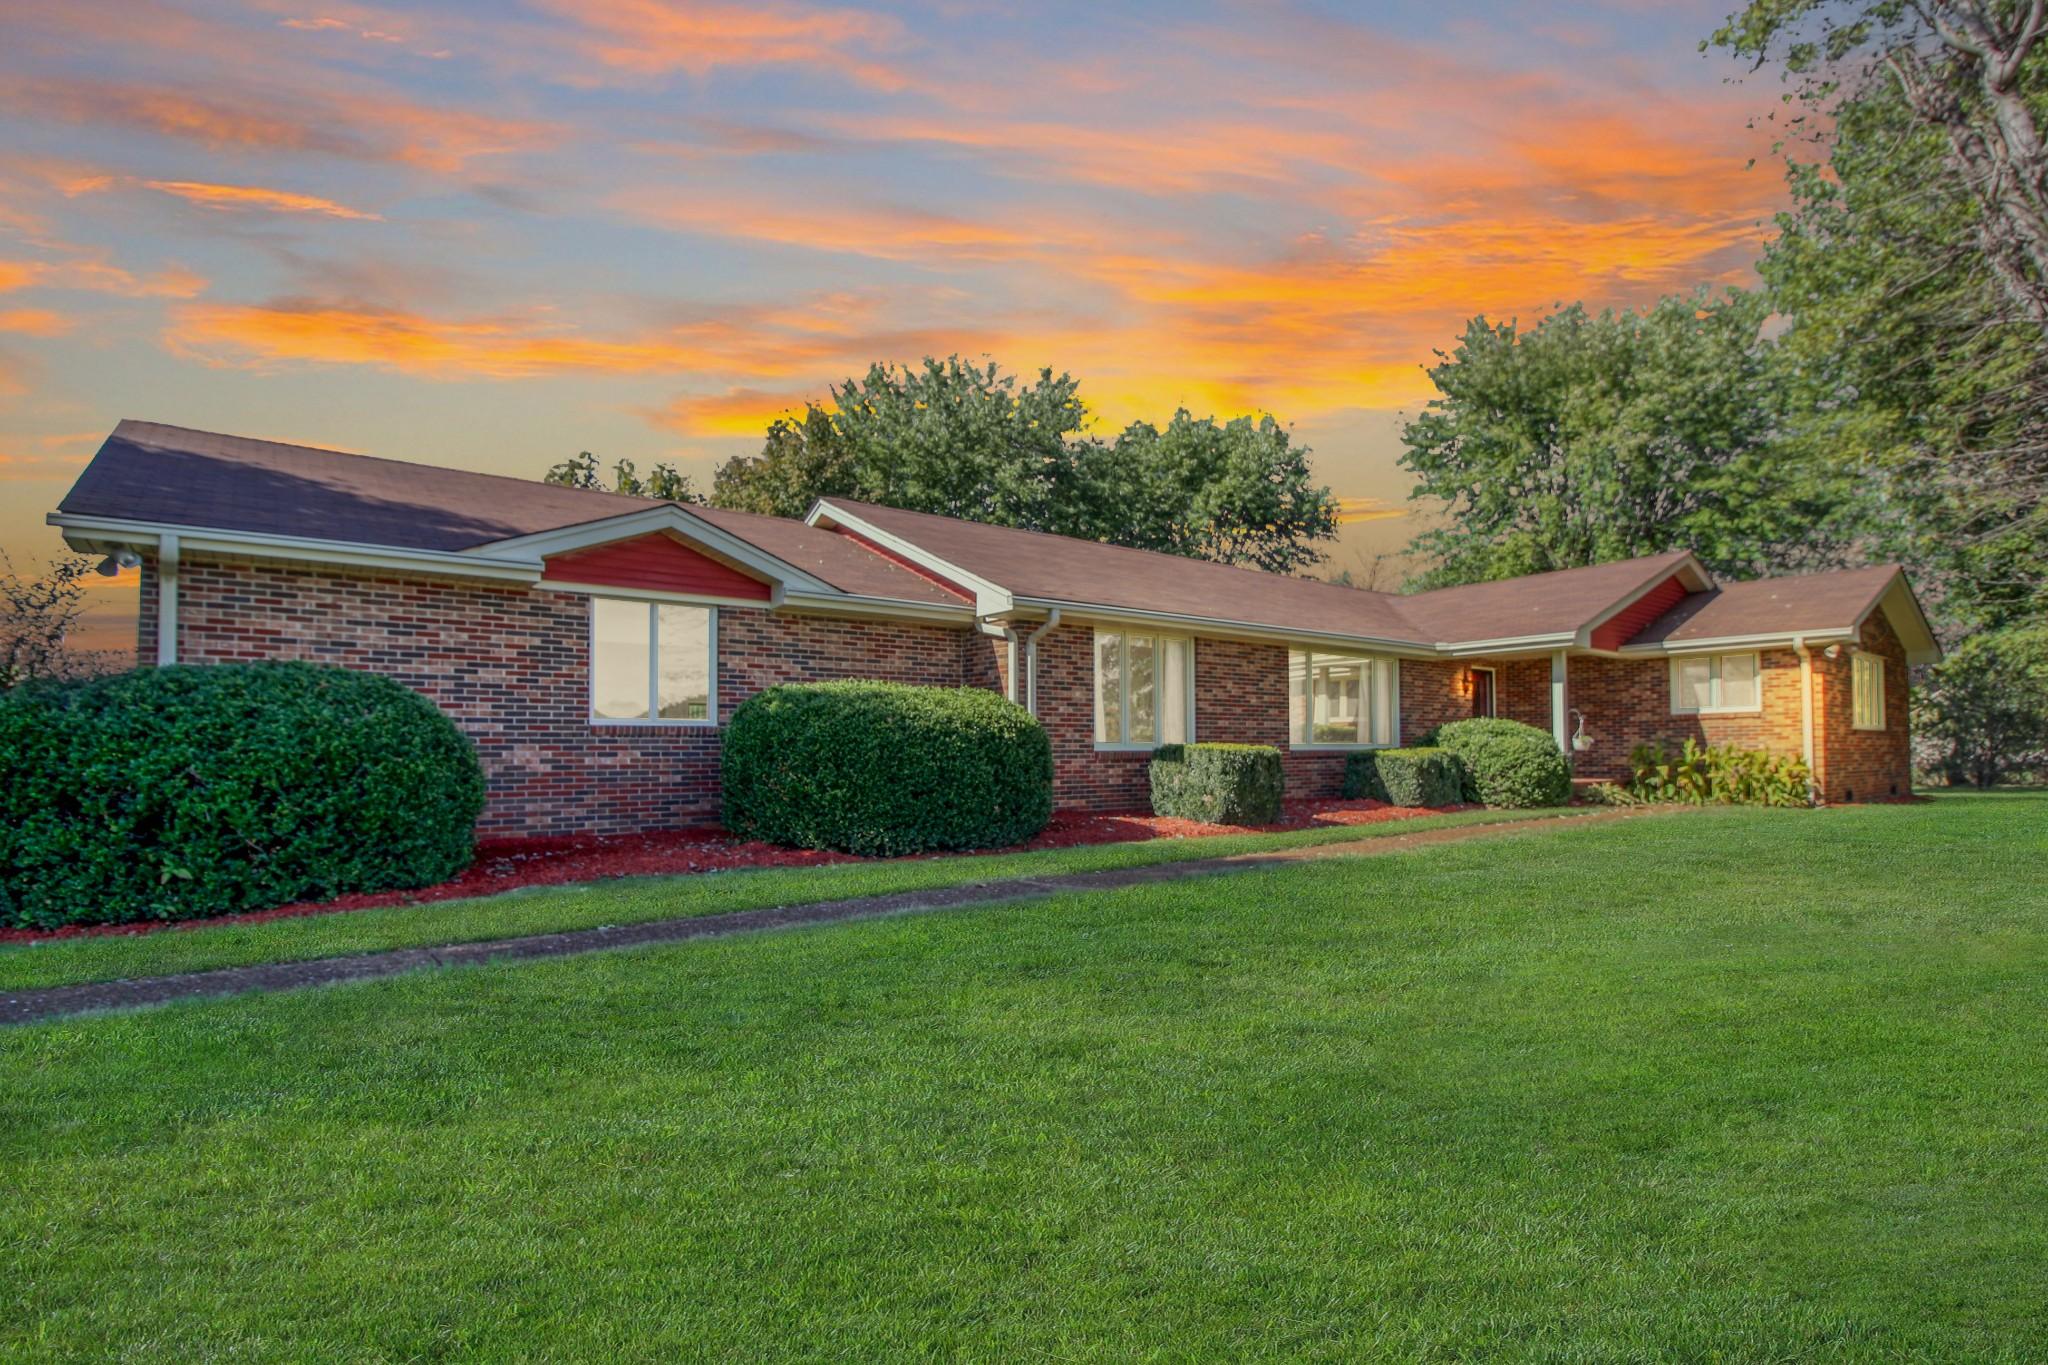 5210 E Robertson Rd, Cross Plains, TN 37049 - Cross Plains, TN real estate listing